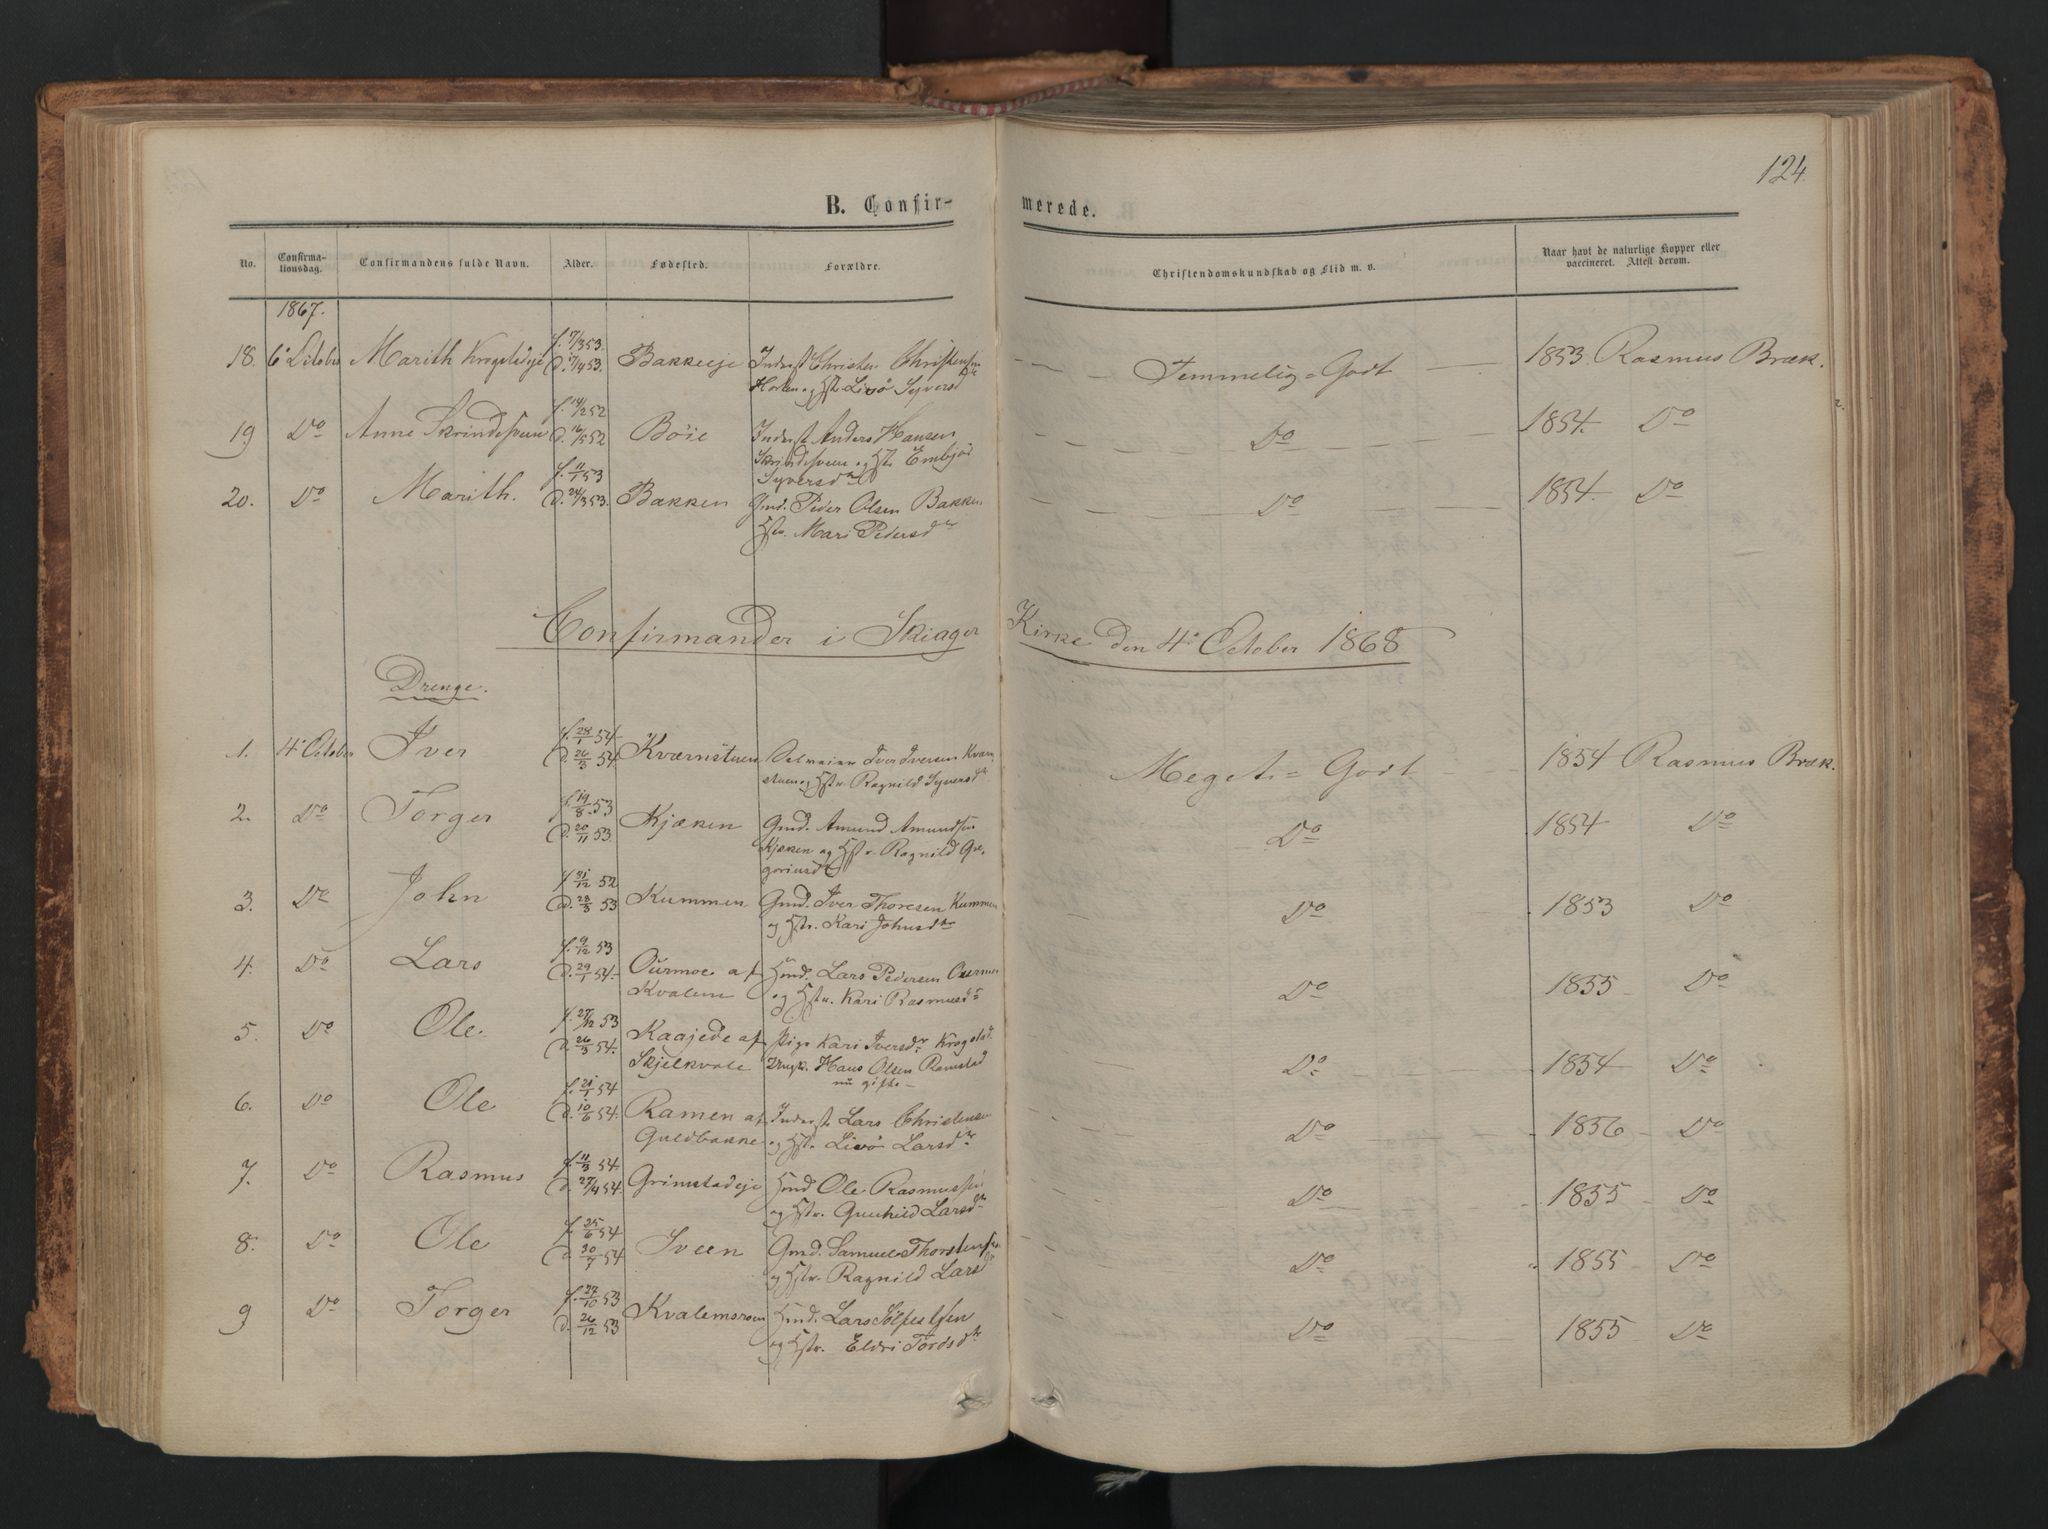 SAH, Skjåk prestekontor, Ministerialbok nr. 1, 1863-1879, s. 124